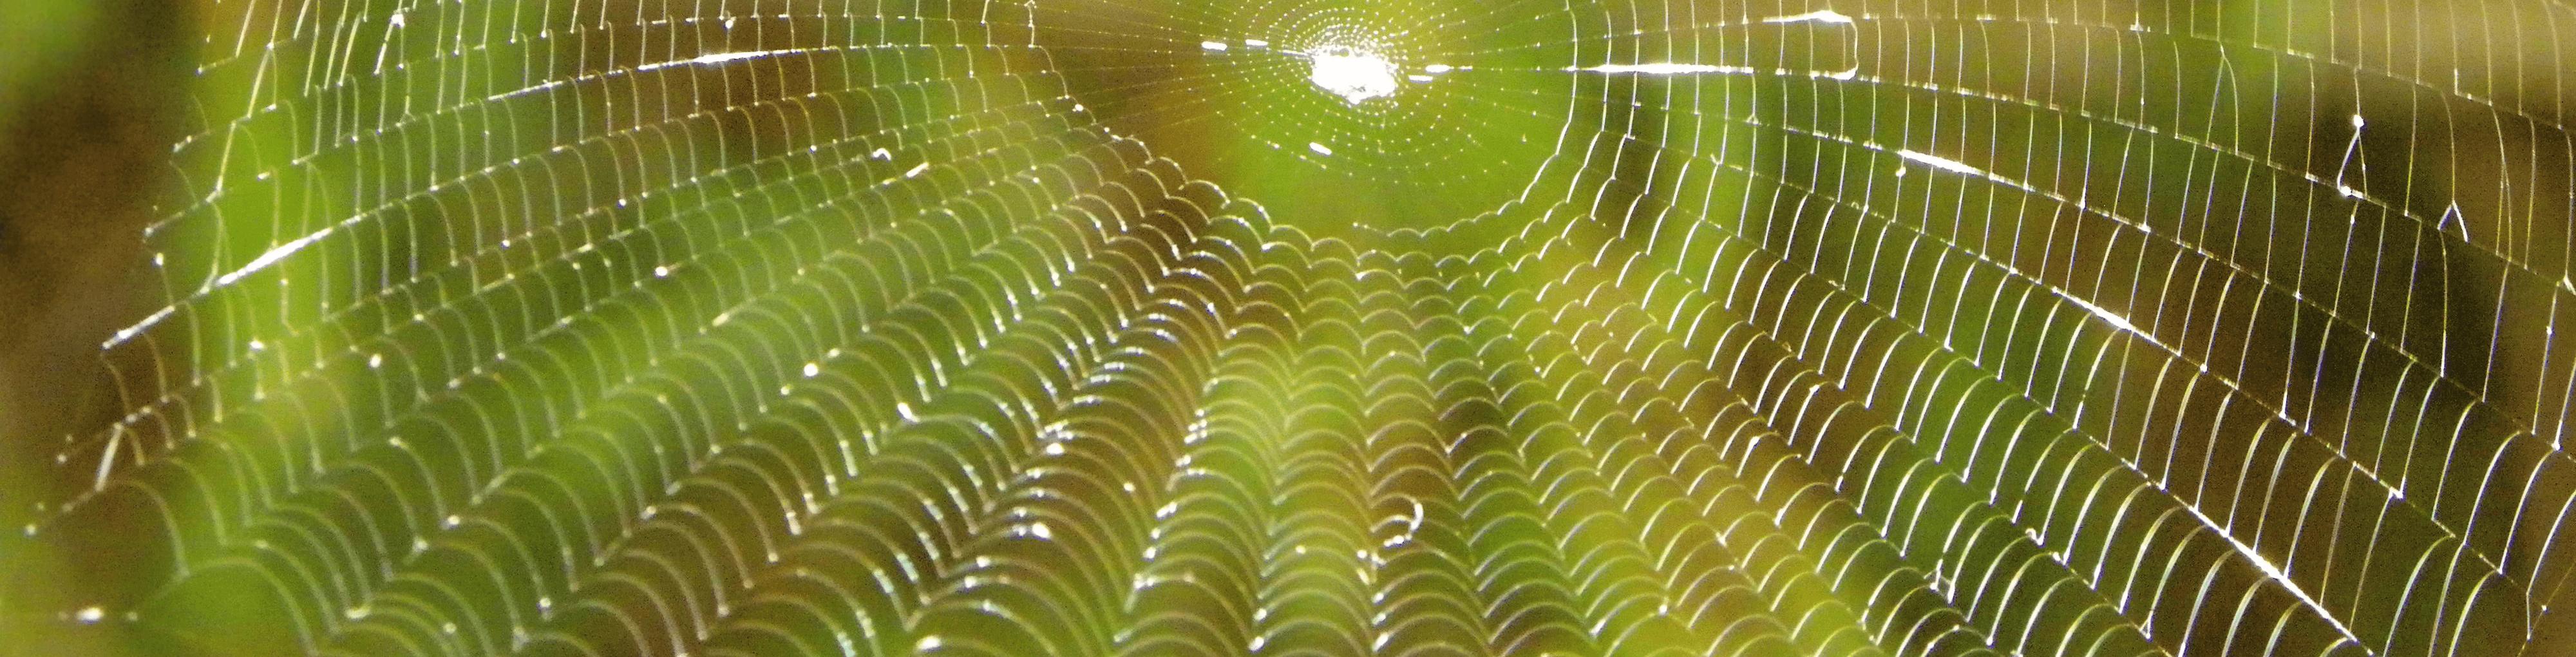 Autumn Web By Tom Hanlon